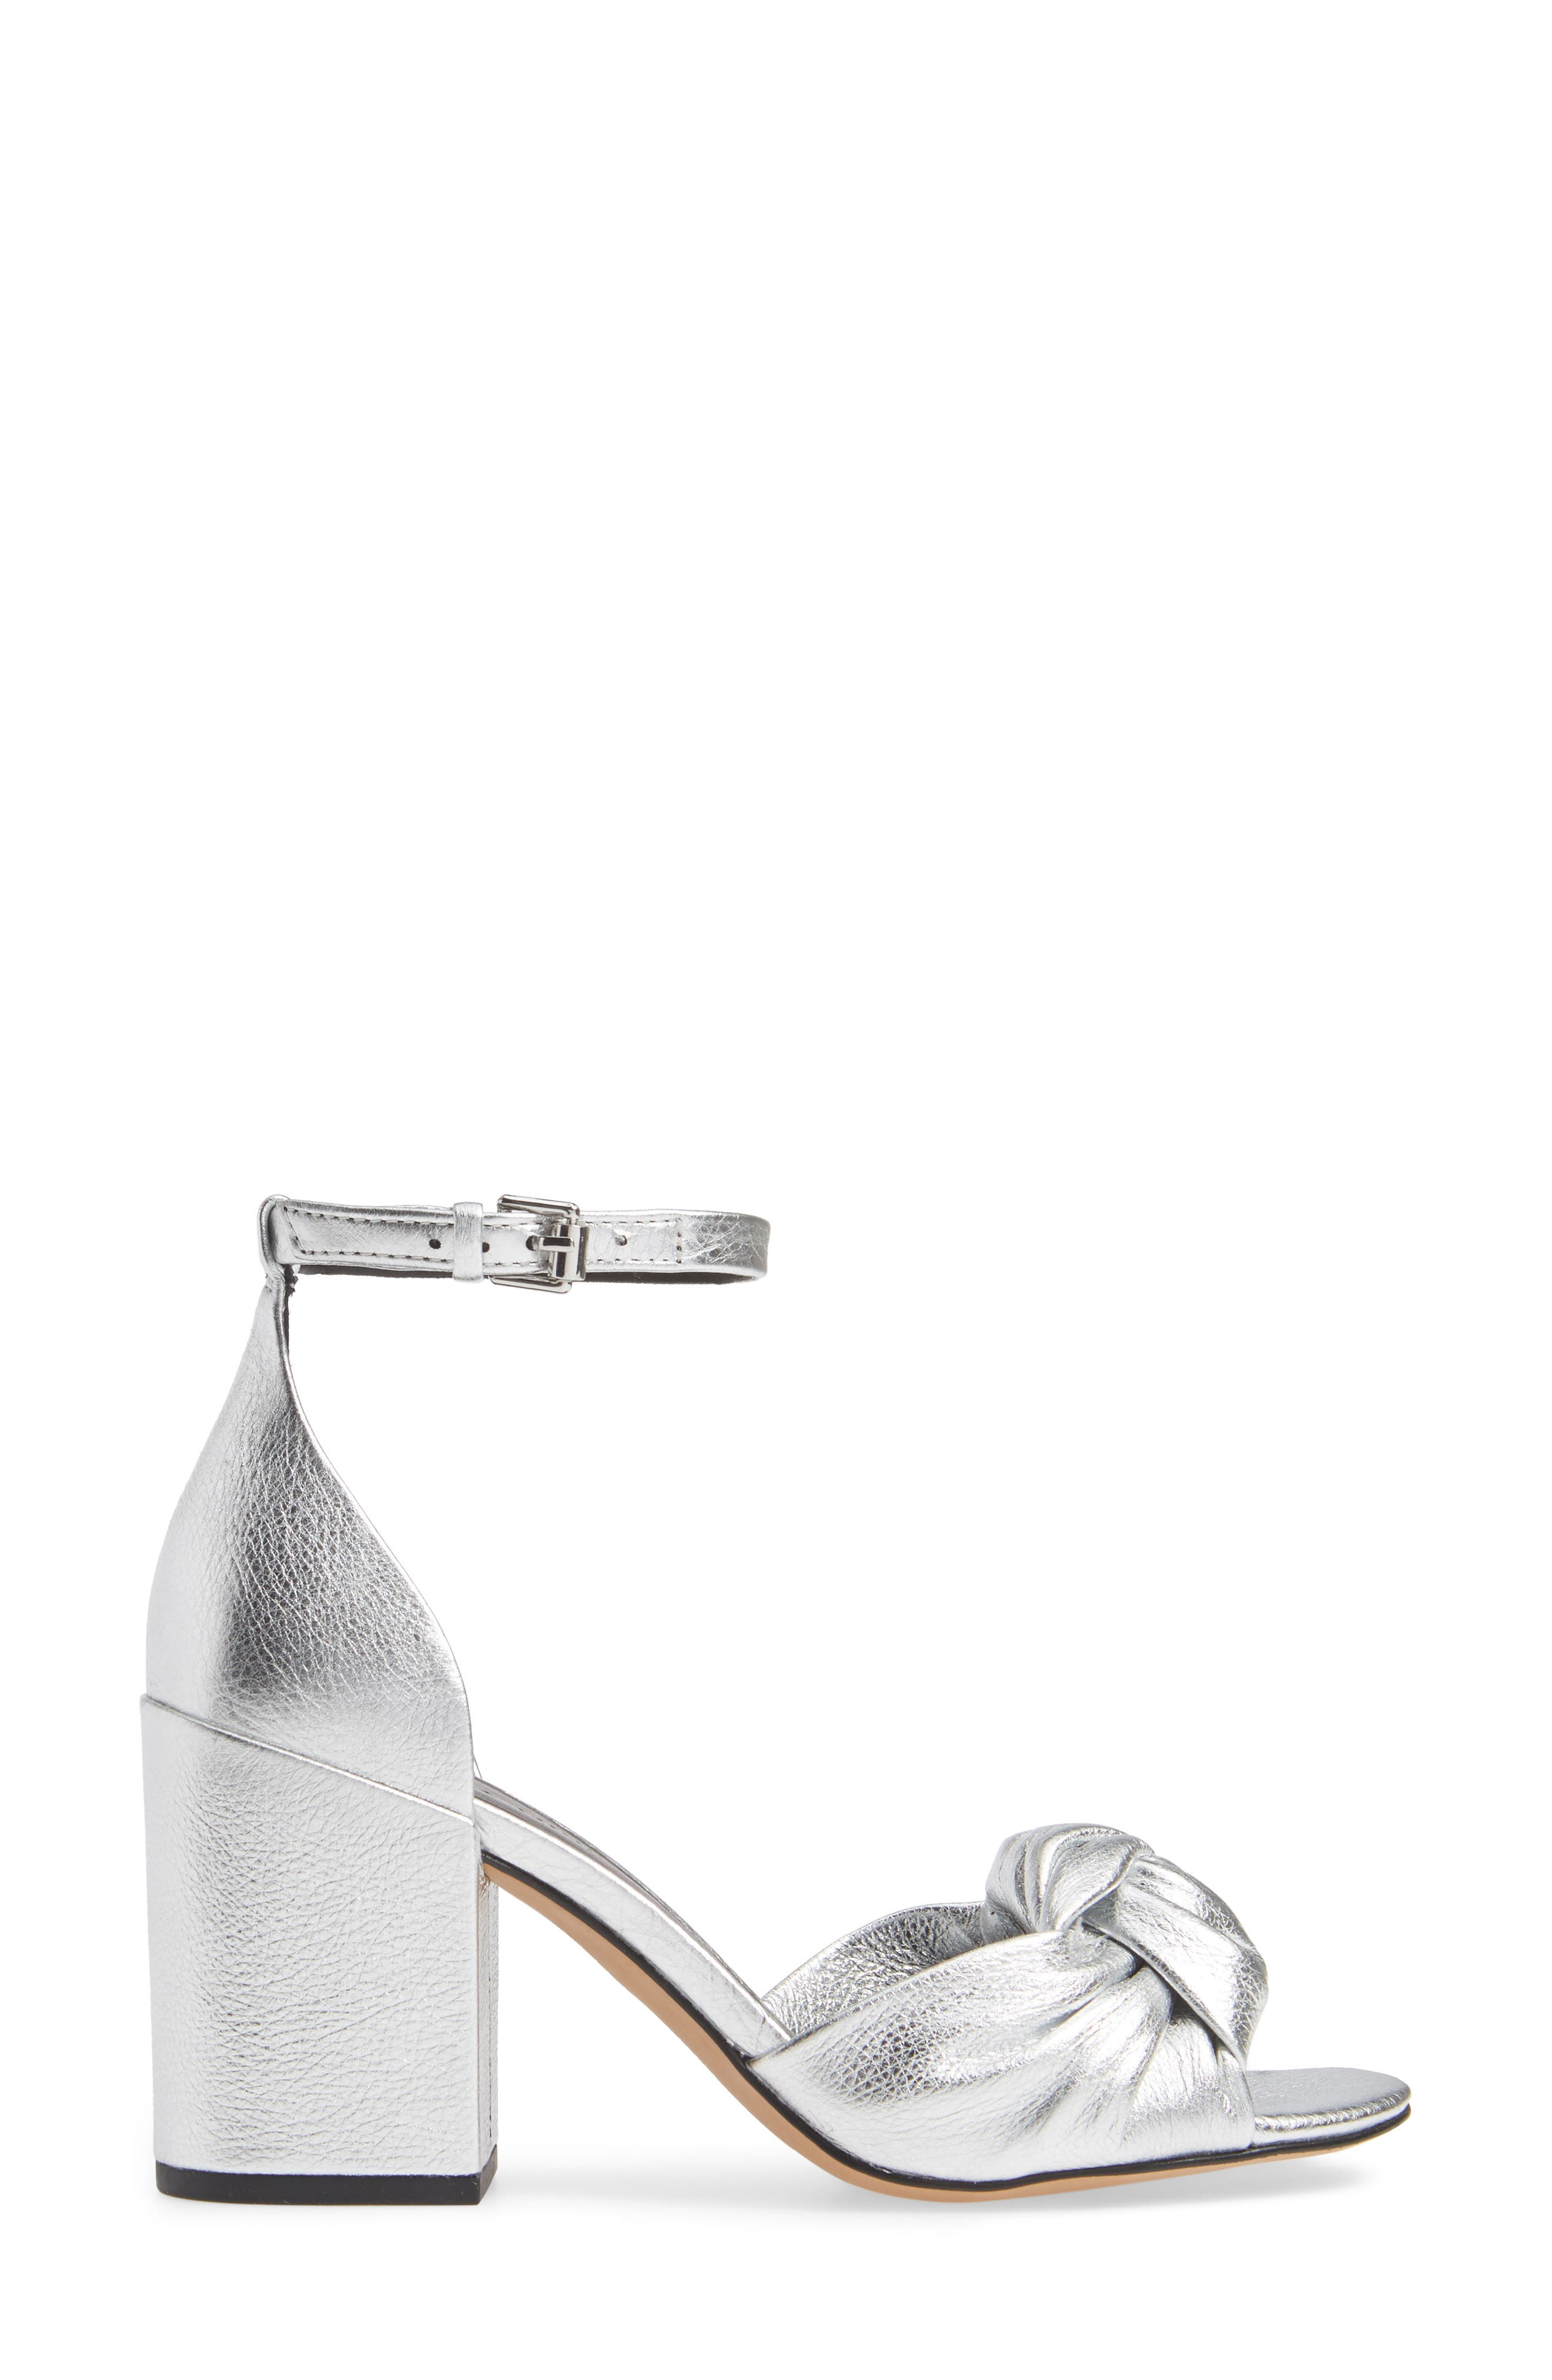 REBECCA MINKOFF, Capriana Ankle Strap Sandal, Alternate thumbnail 3, color, SILVER LEATHER